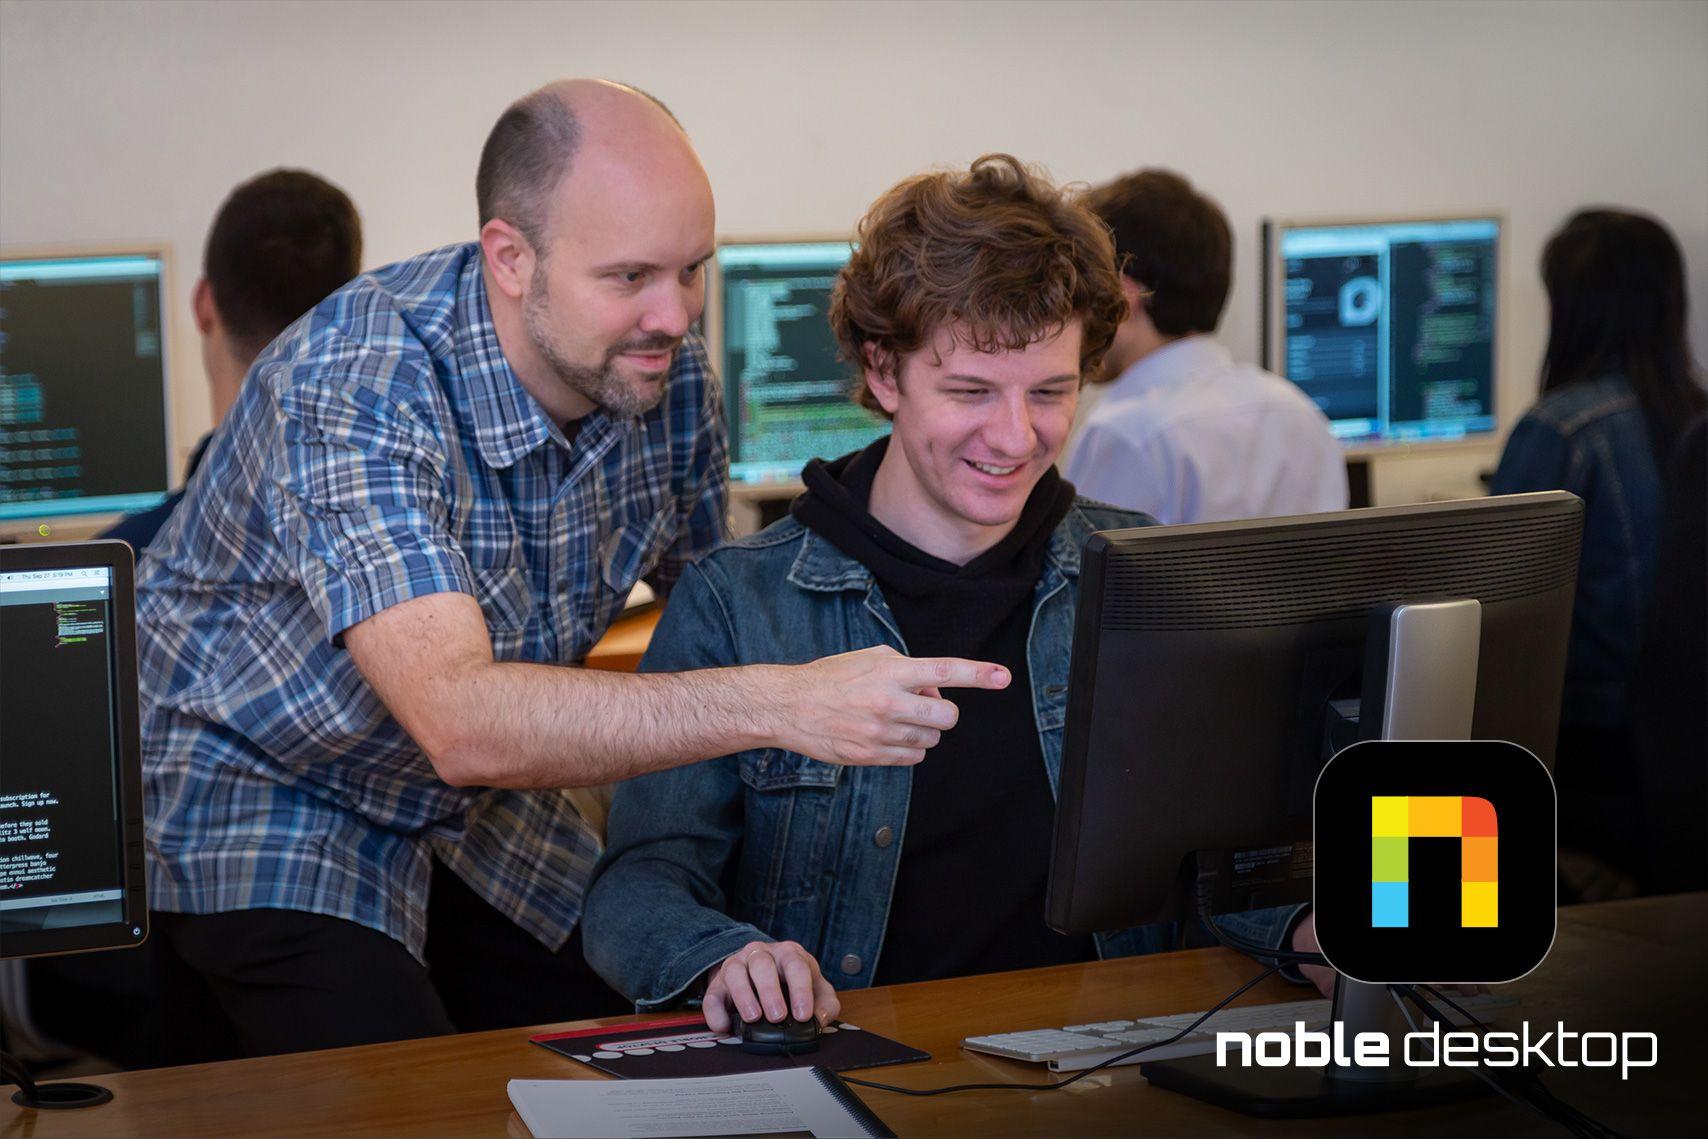 Noble Desktop